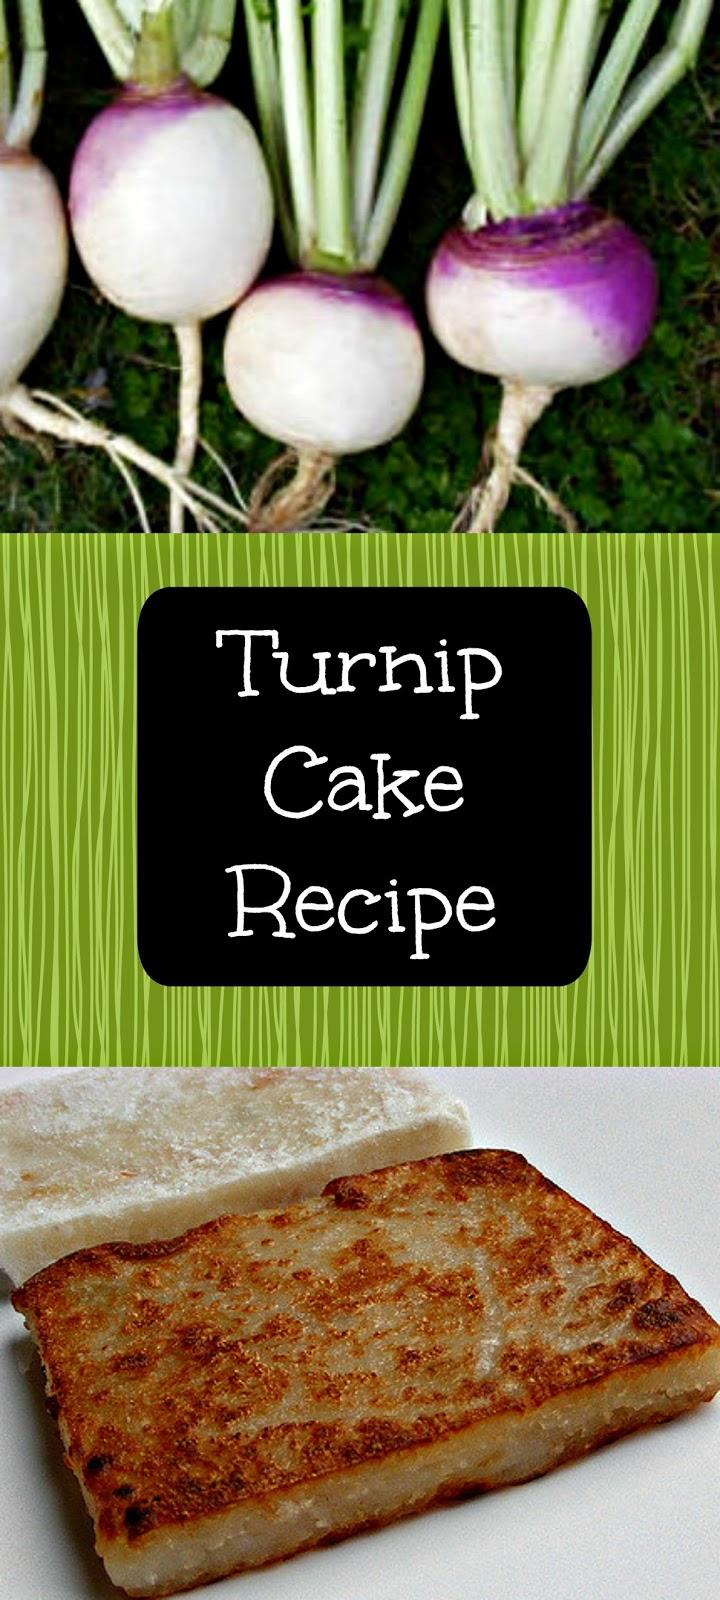 The Smoothie Vegetarians Recipe Turnip Cake